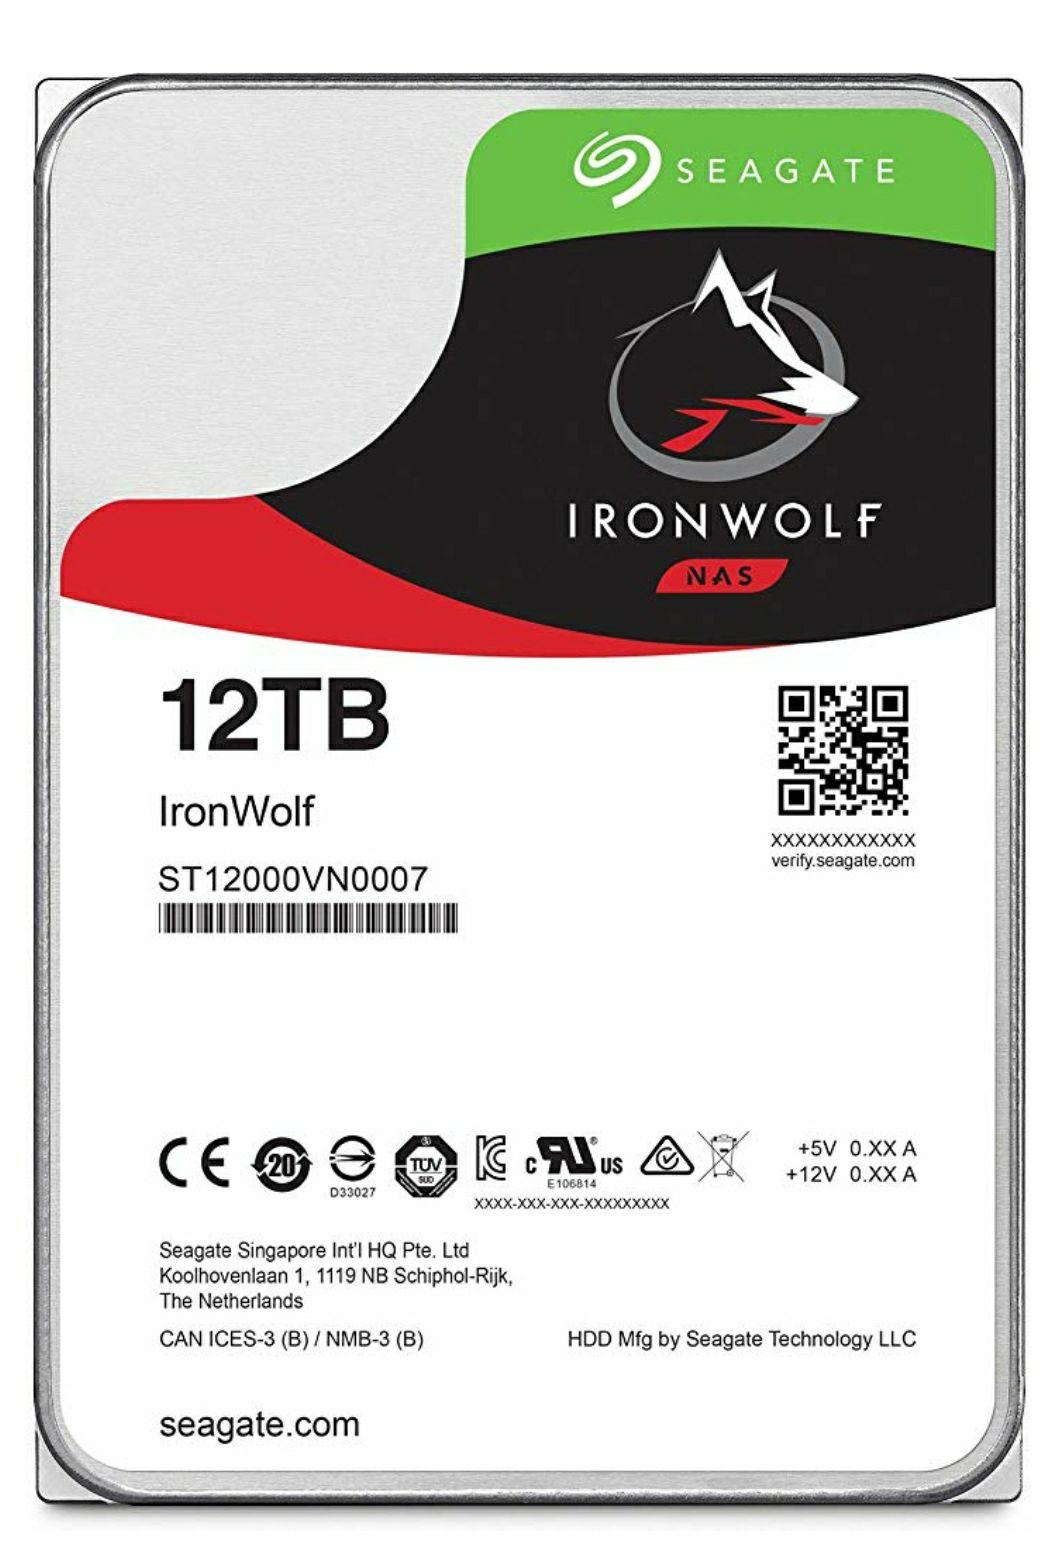 SeagateST12000VNZ007 IronWolf 12 TB NAS HDD interne Festplatte (8,9 cm (3,5 Zoll), 7200 u/min, 256 MB Cache, SATA 6 GB/s, silber